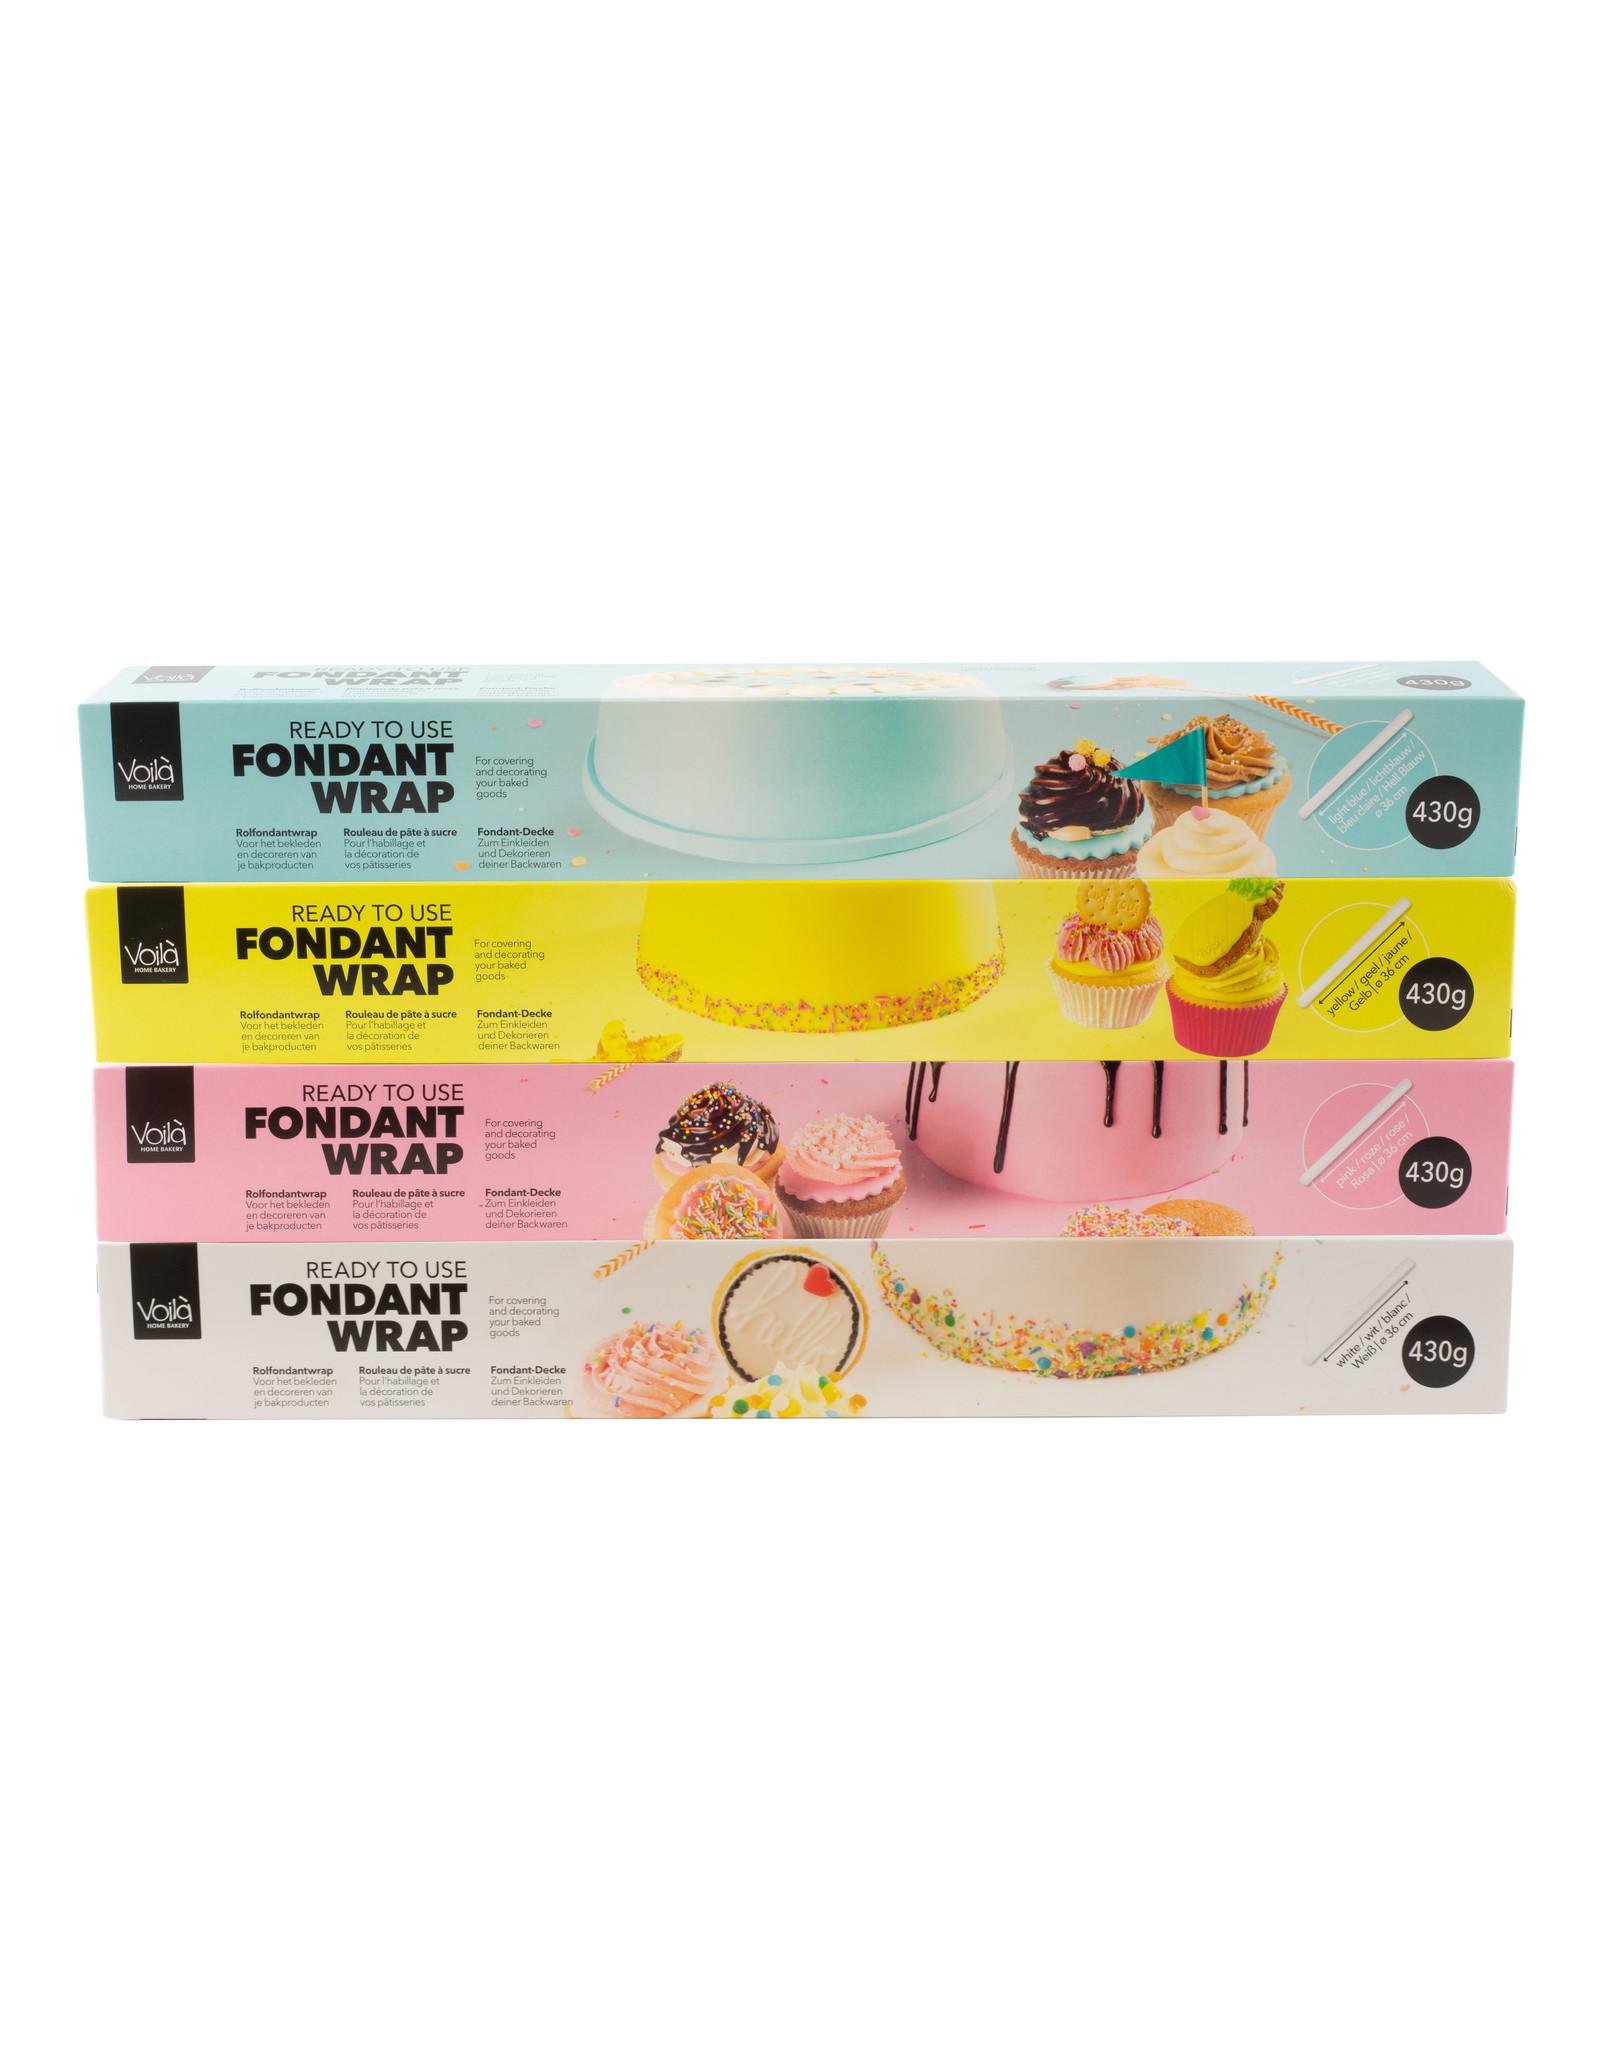 VOILA Home Bakery Voila rolled fondant wrap pink - 430 grams